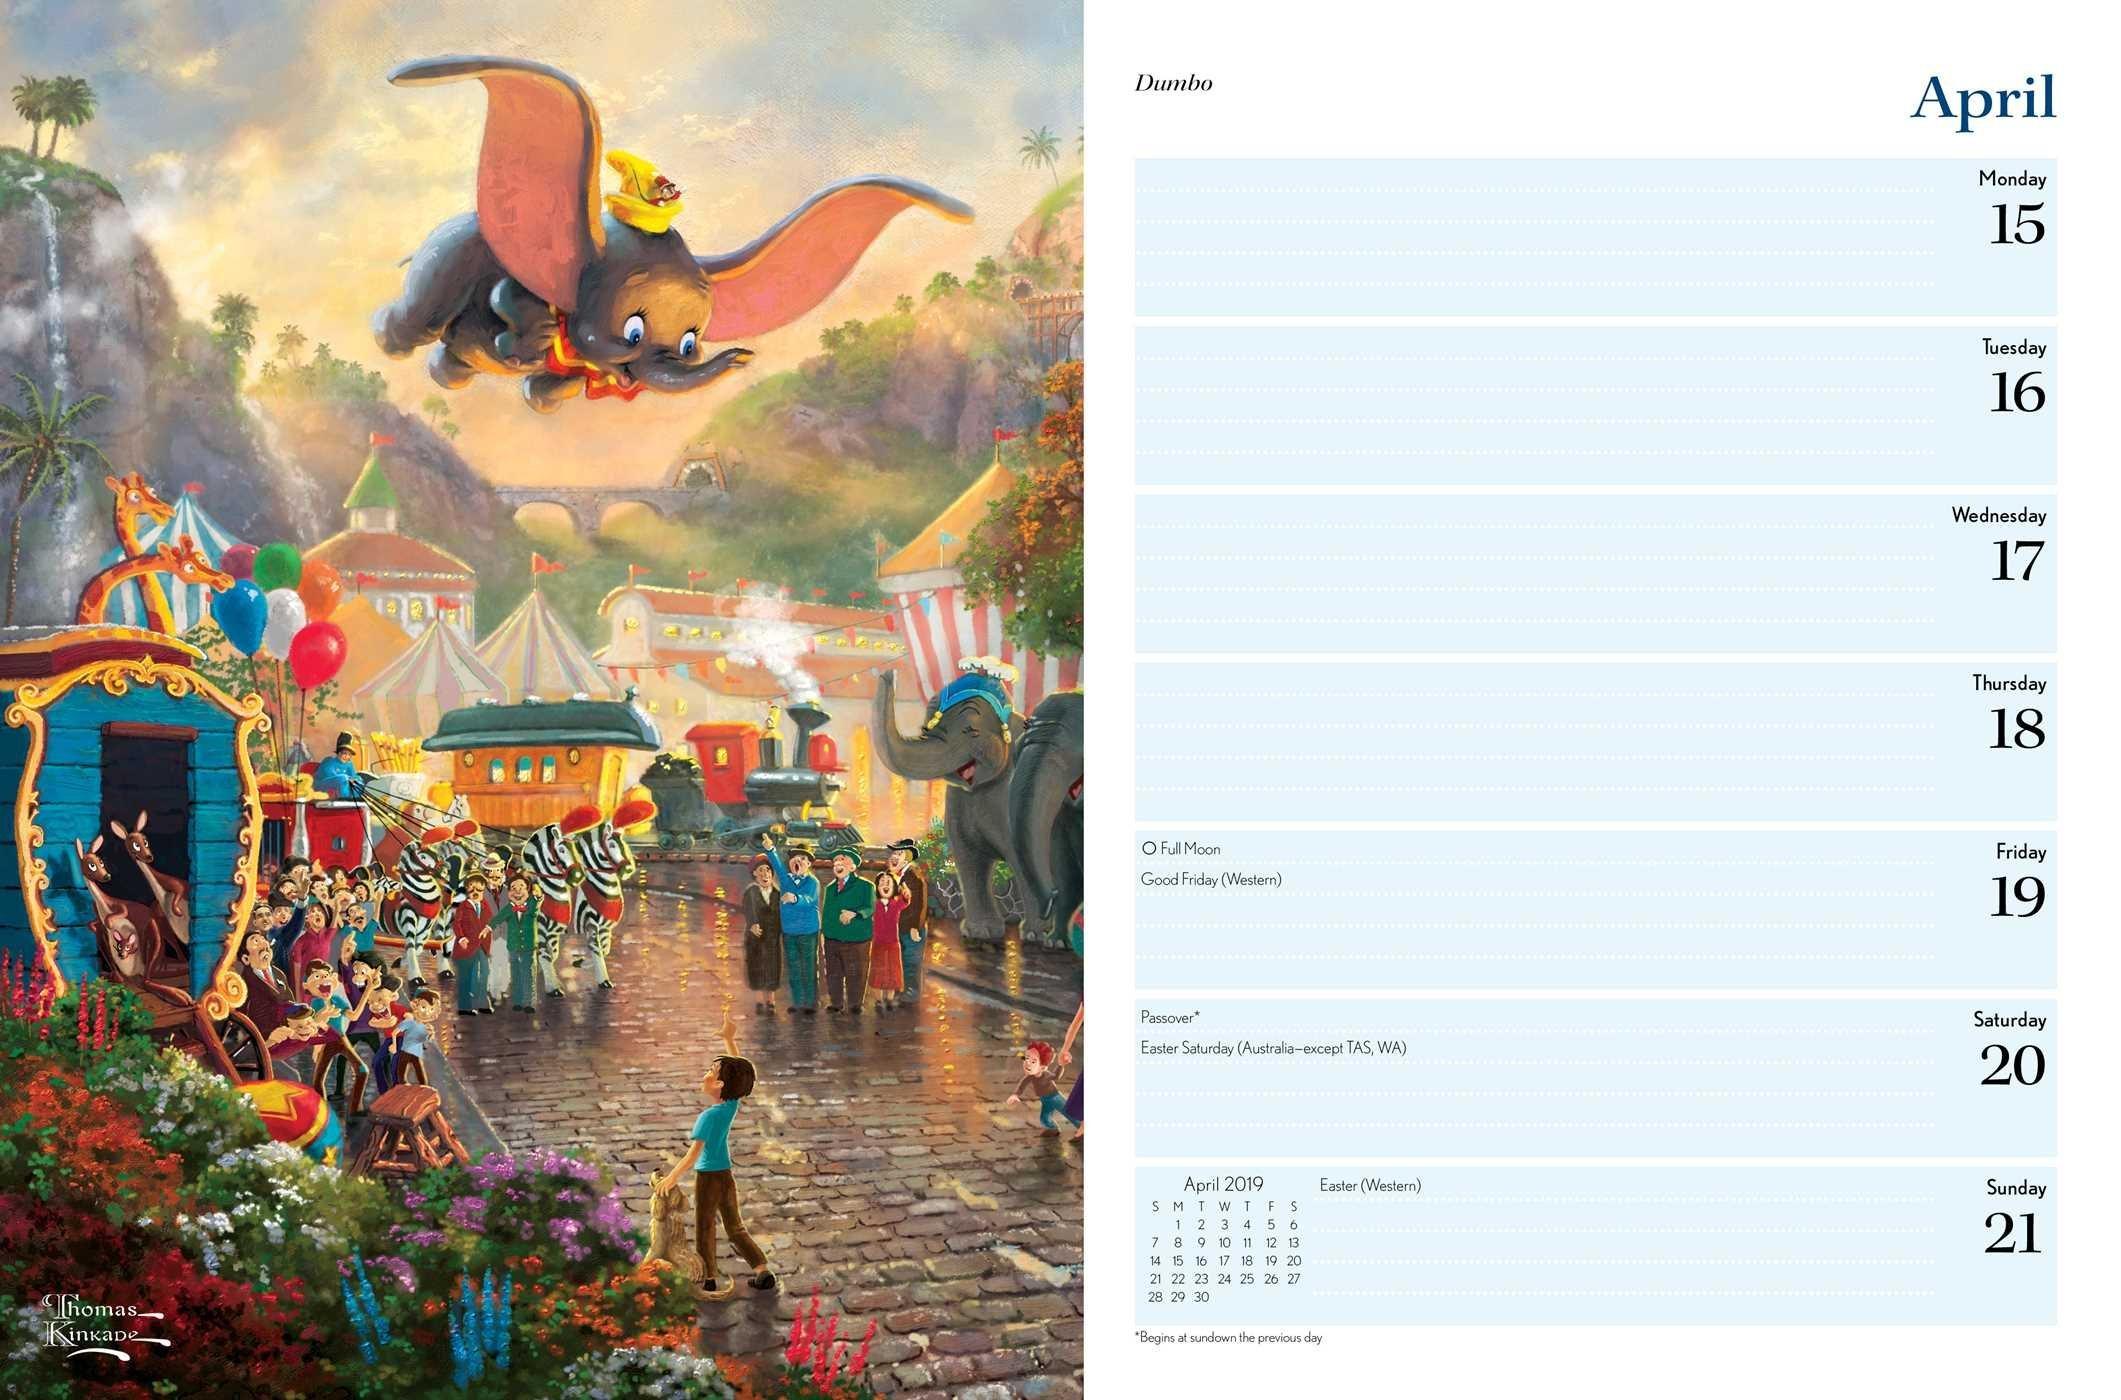 Disney Dreams Collection 2019 Engagement Calendar - Disneyland.shopping Calendar 2019 Thomas Kinkade